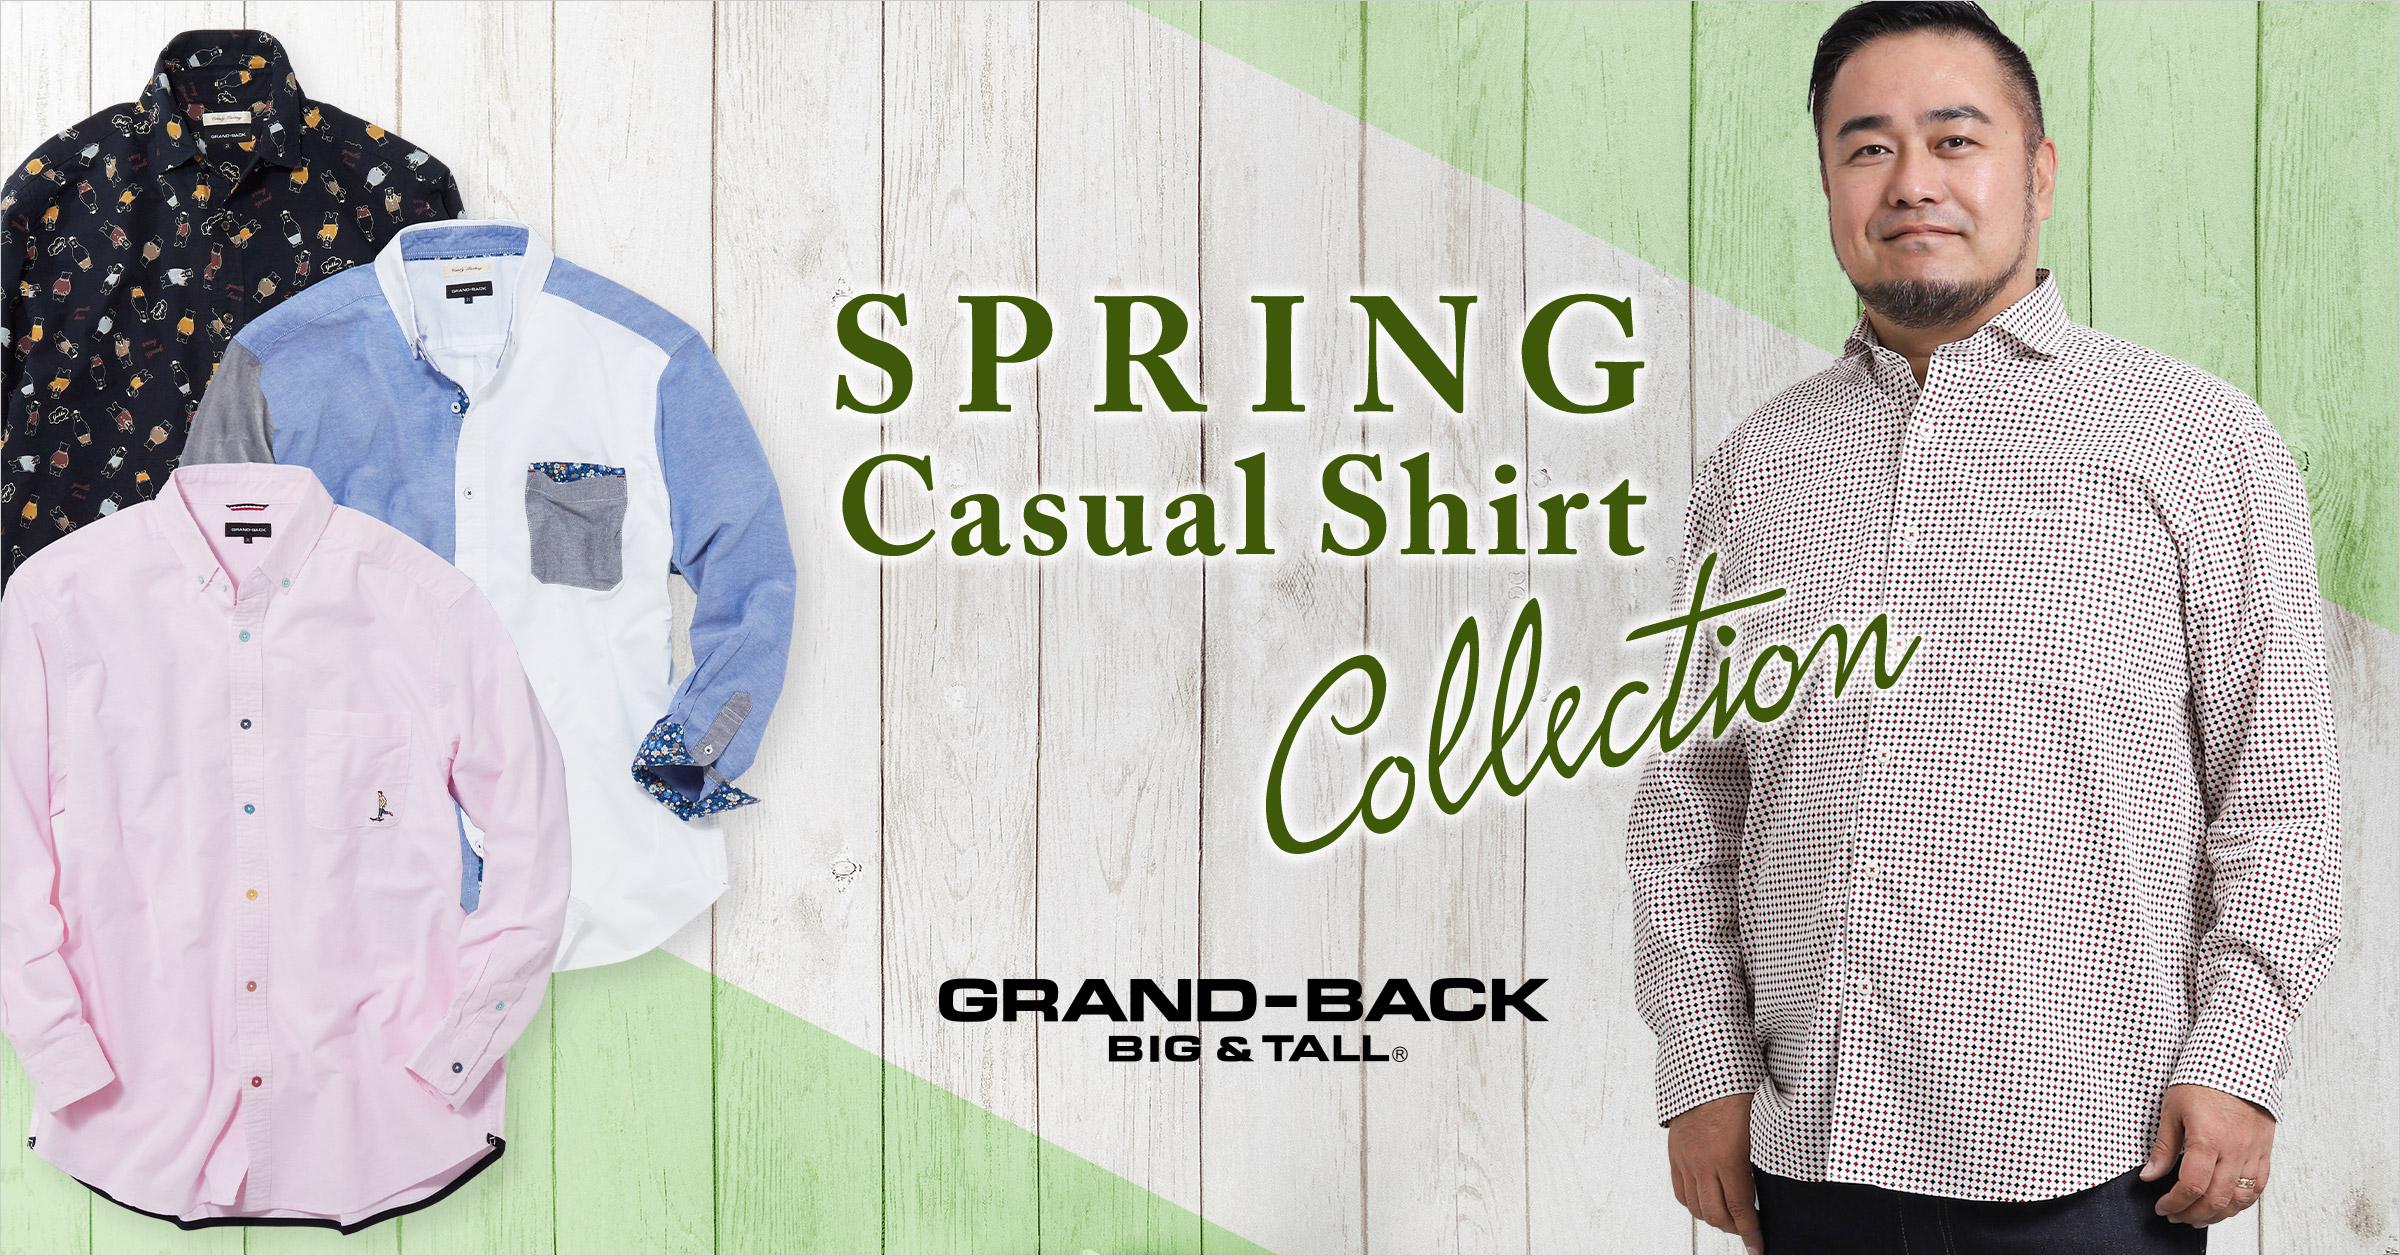 GRAND-BACK Spring Casual Shirt